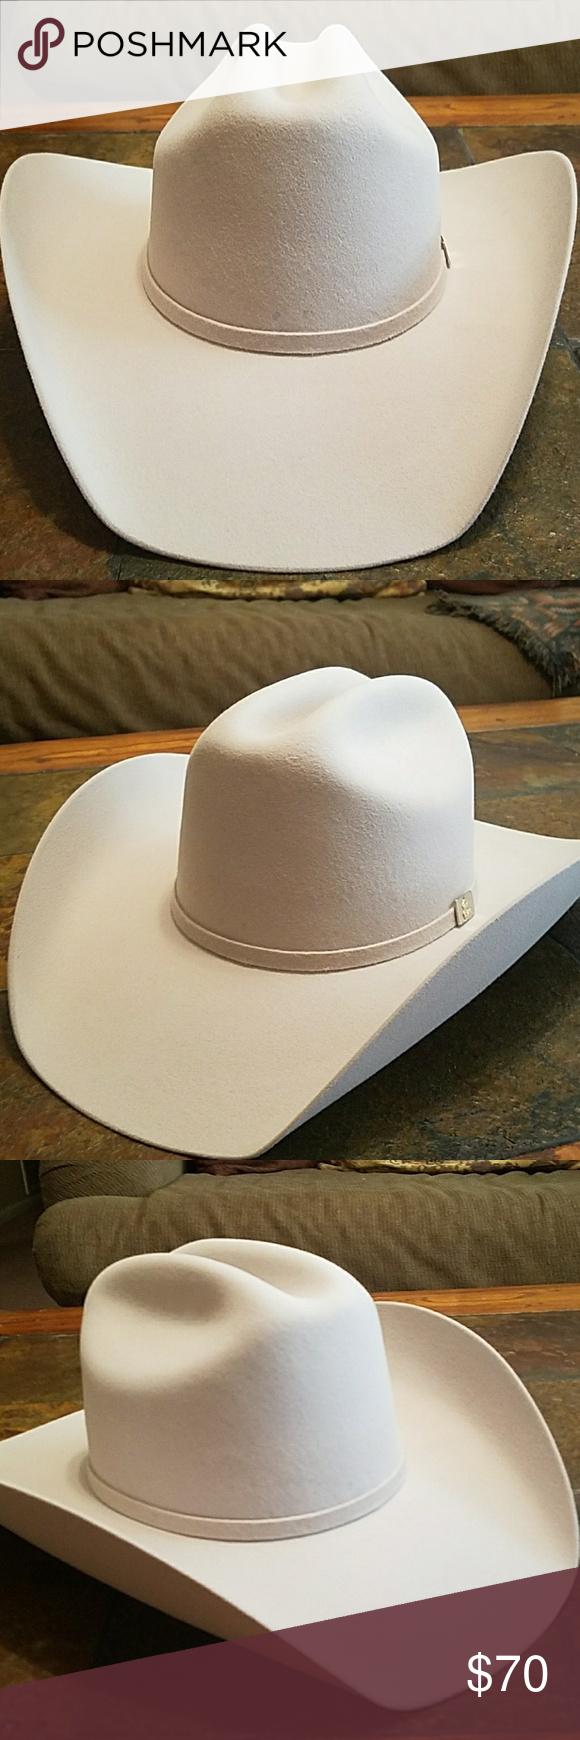 Wool Felt Cowboy Hat Cowboy Hats Felt Cowboy Hats Cowboy